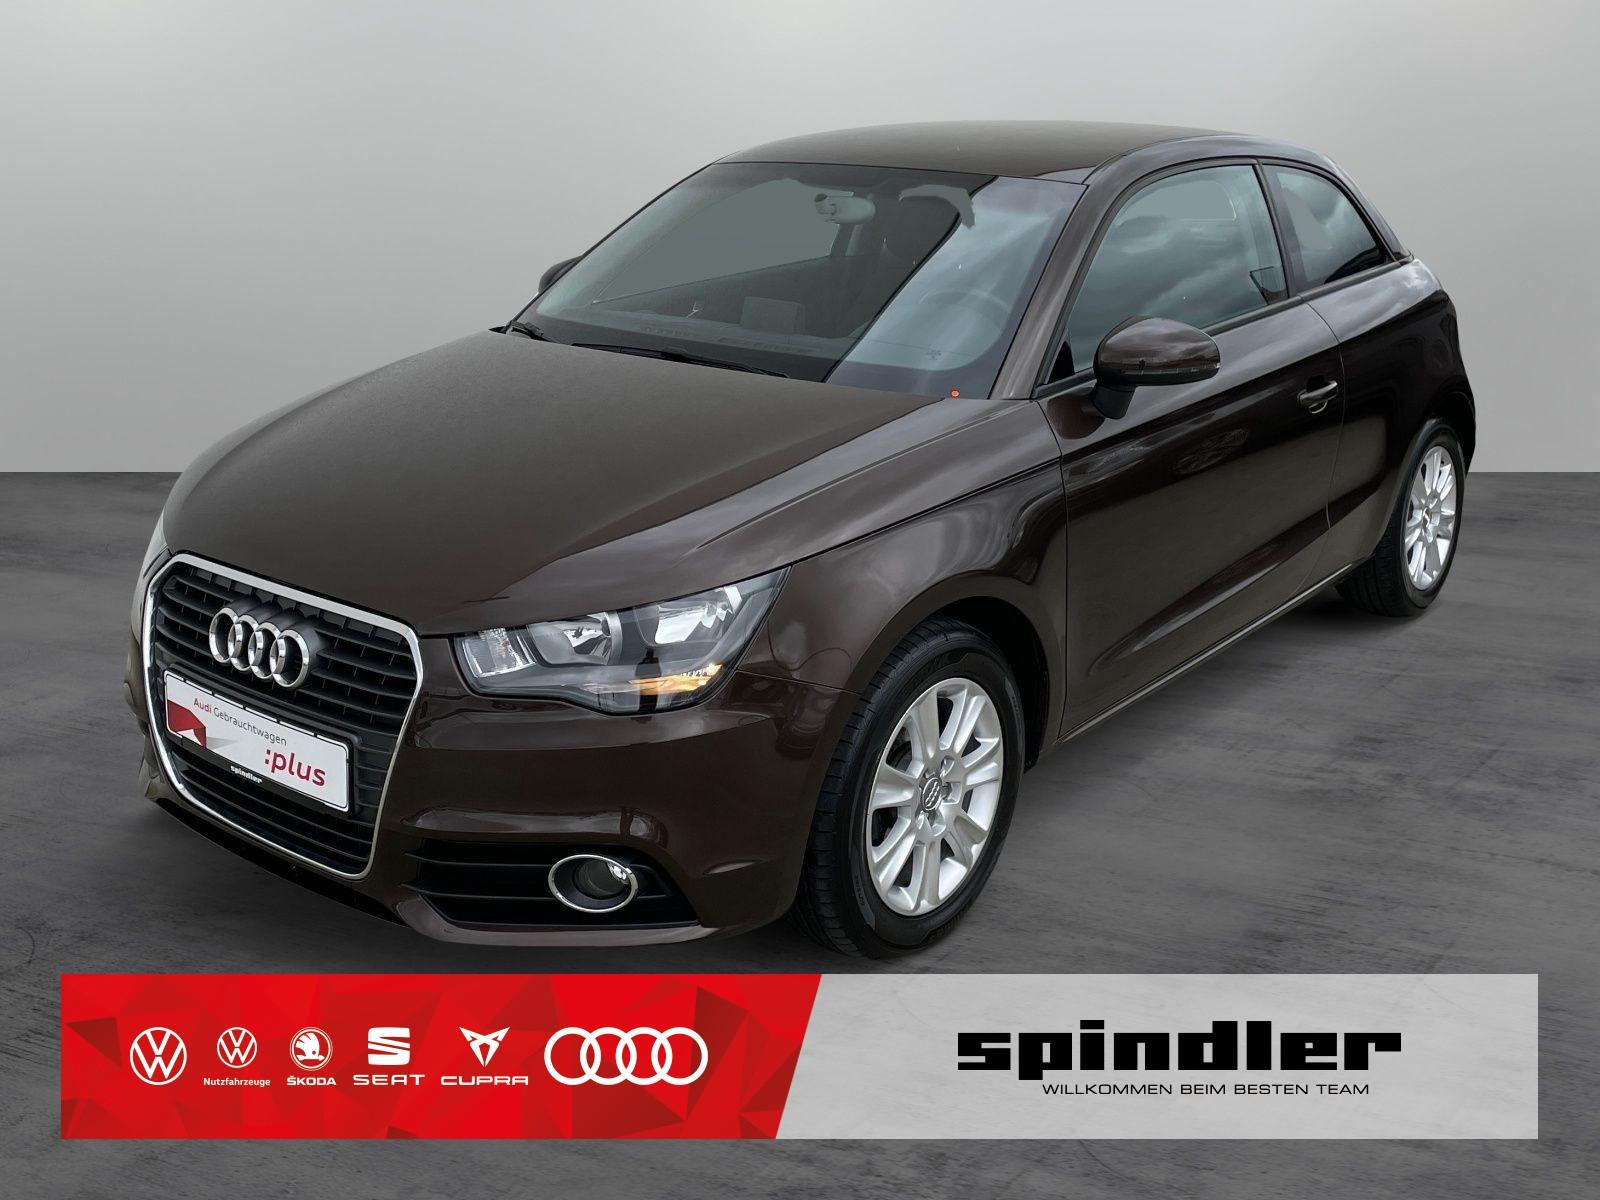 Audi A1 1.2 TFSI 5-Gang/ Klima, Bluetooth,Sitzheizung, Jahr 2014, Benzin